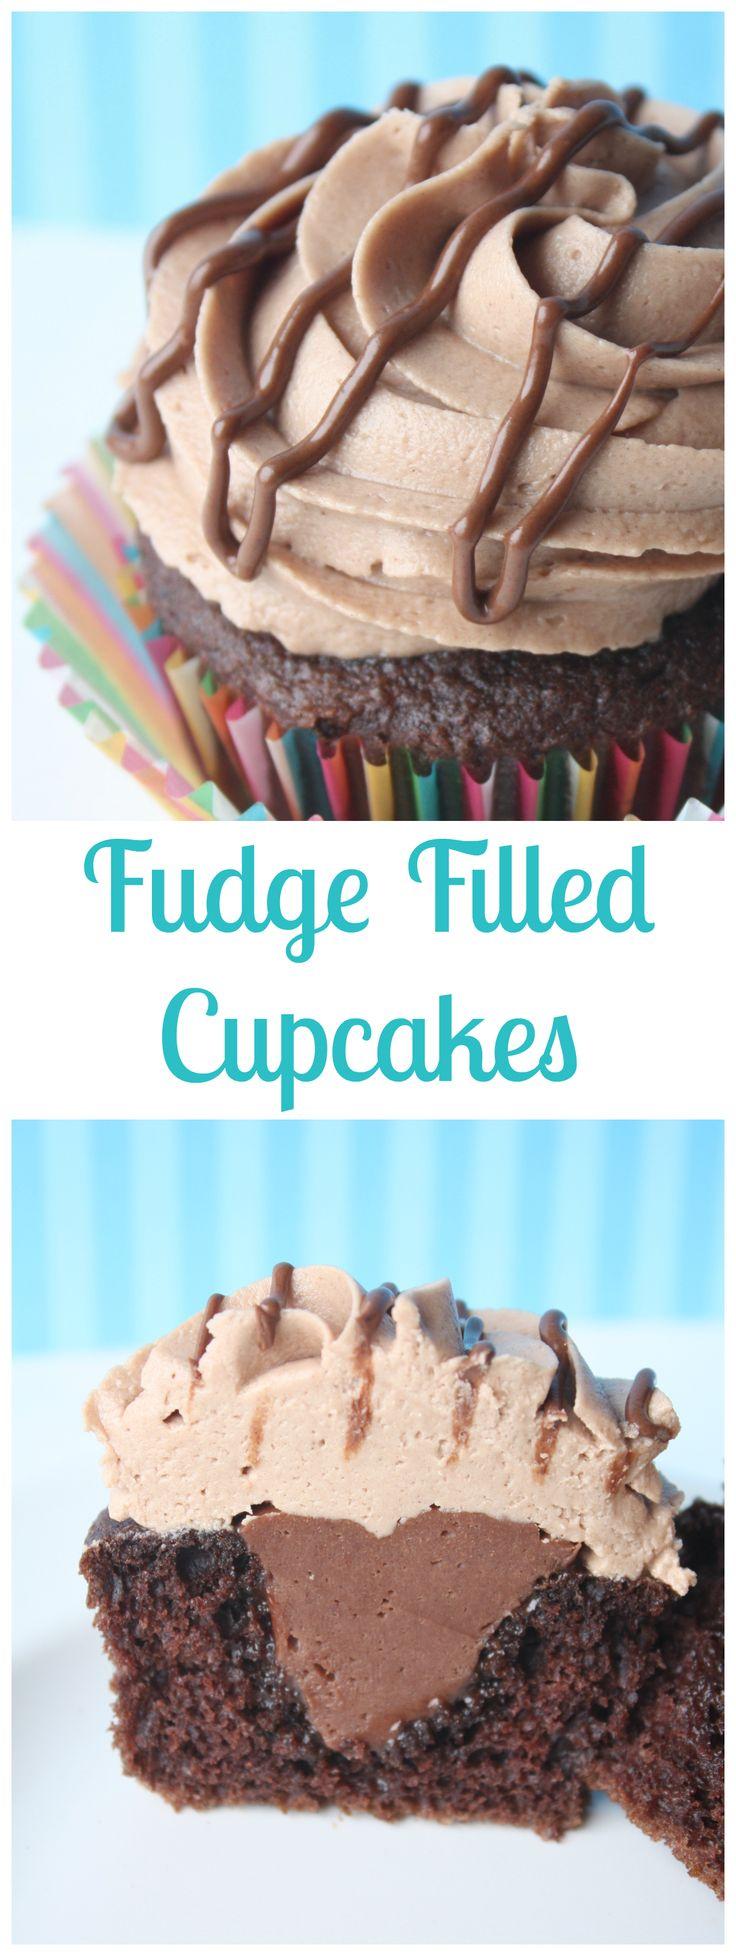 Fudge Filled Cupcakes